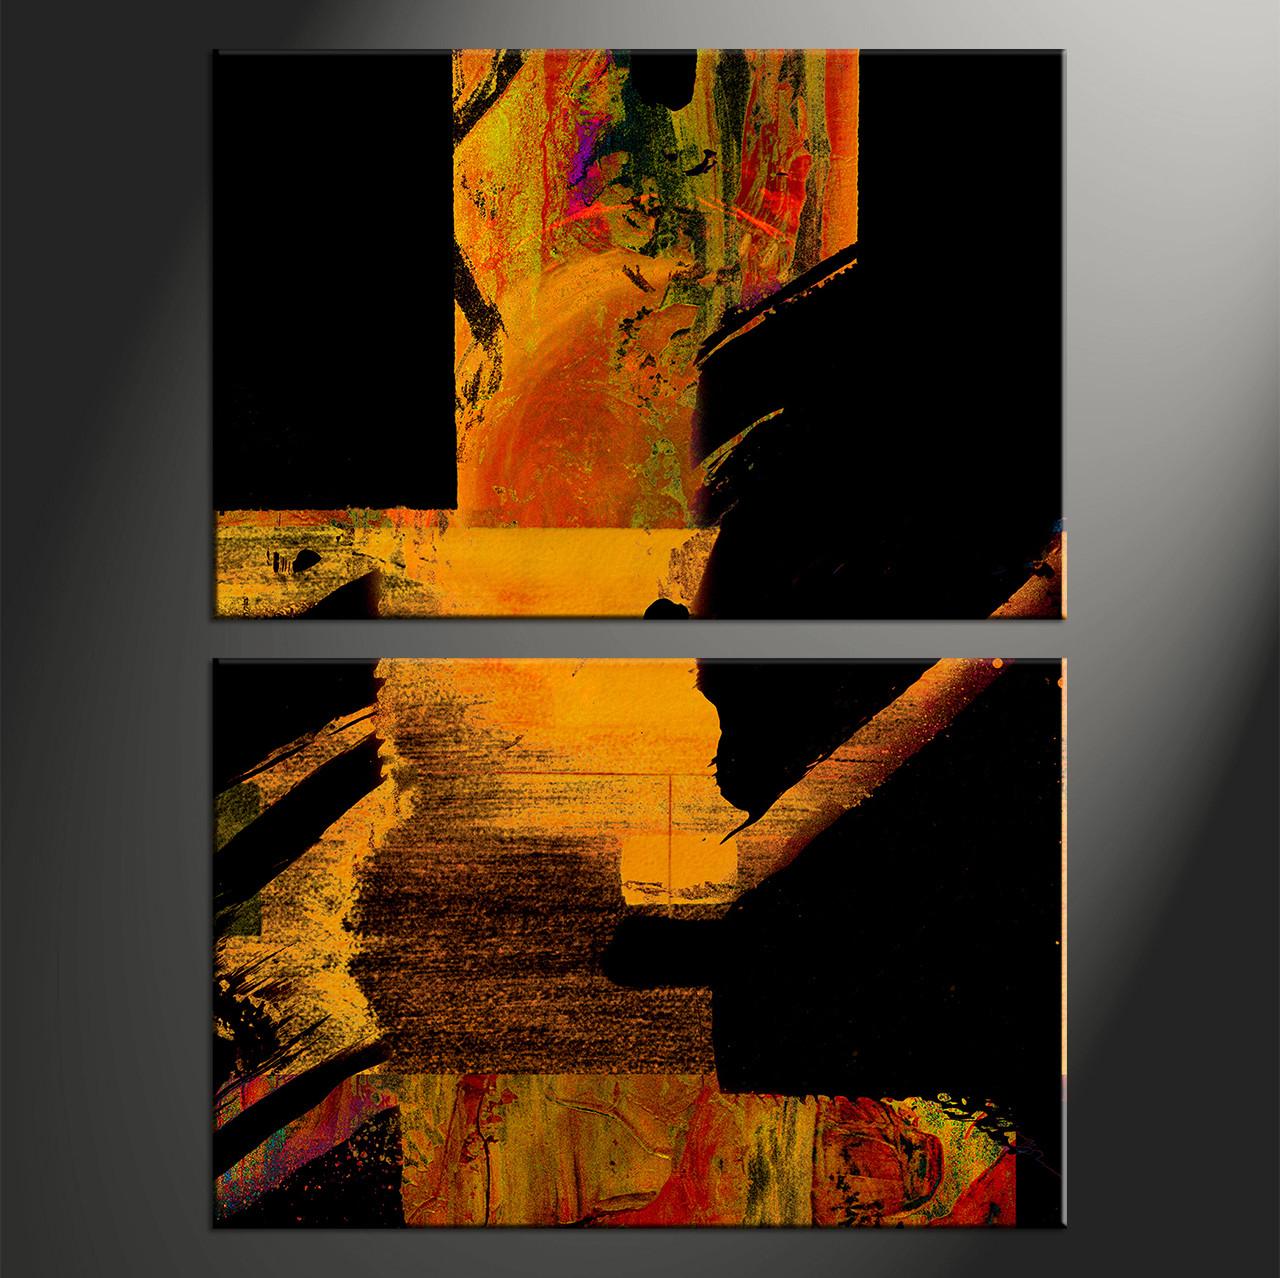 2 Piece Orange Brown Vertical Canvas Abstract Black Artwork Oil Paintings